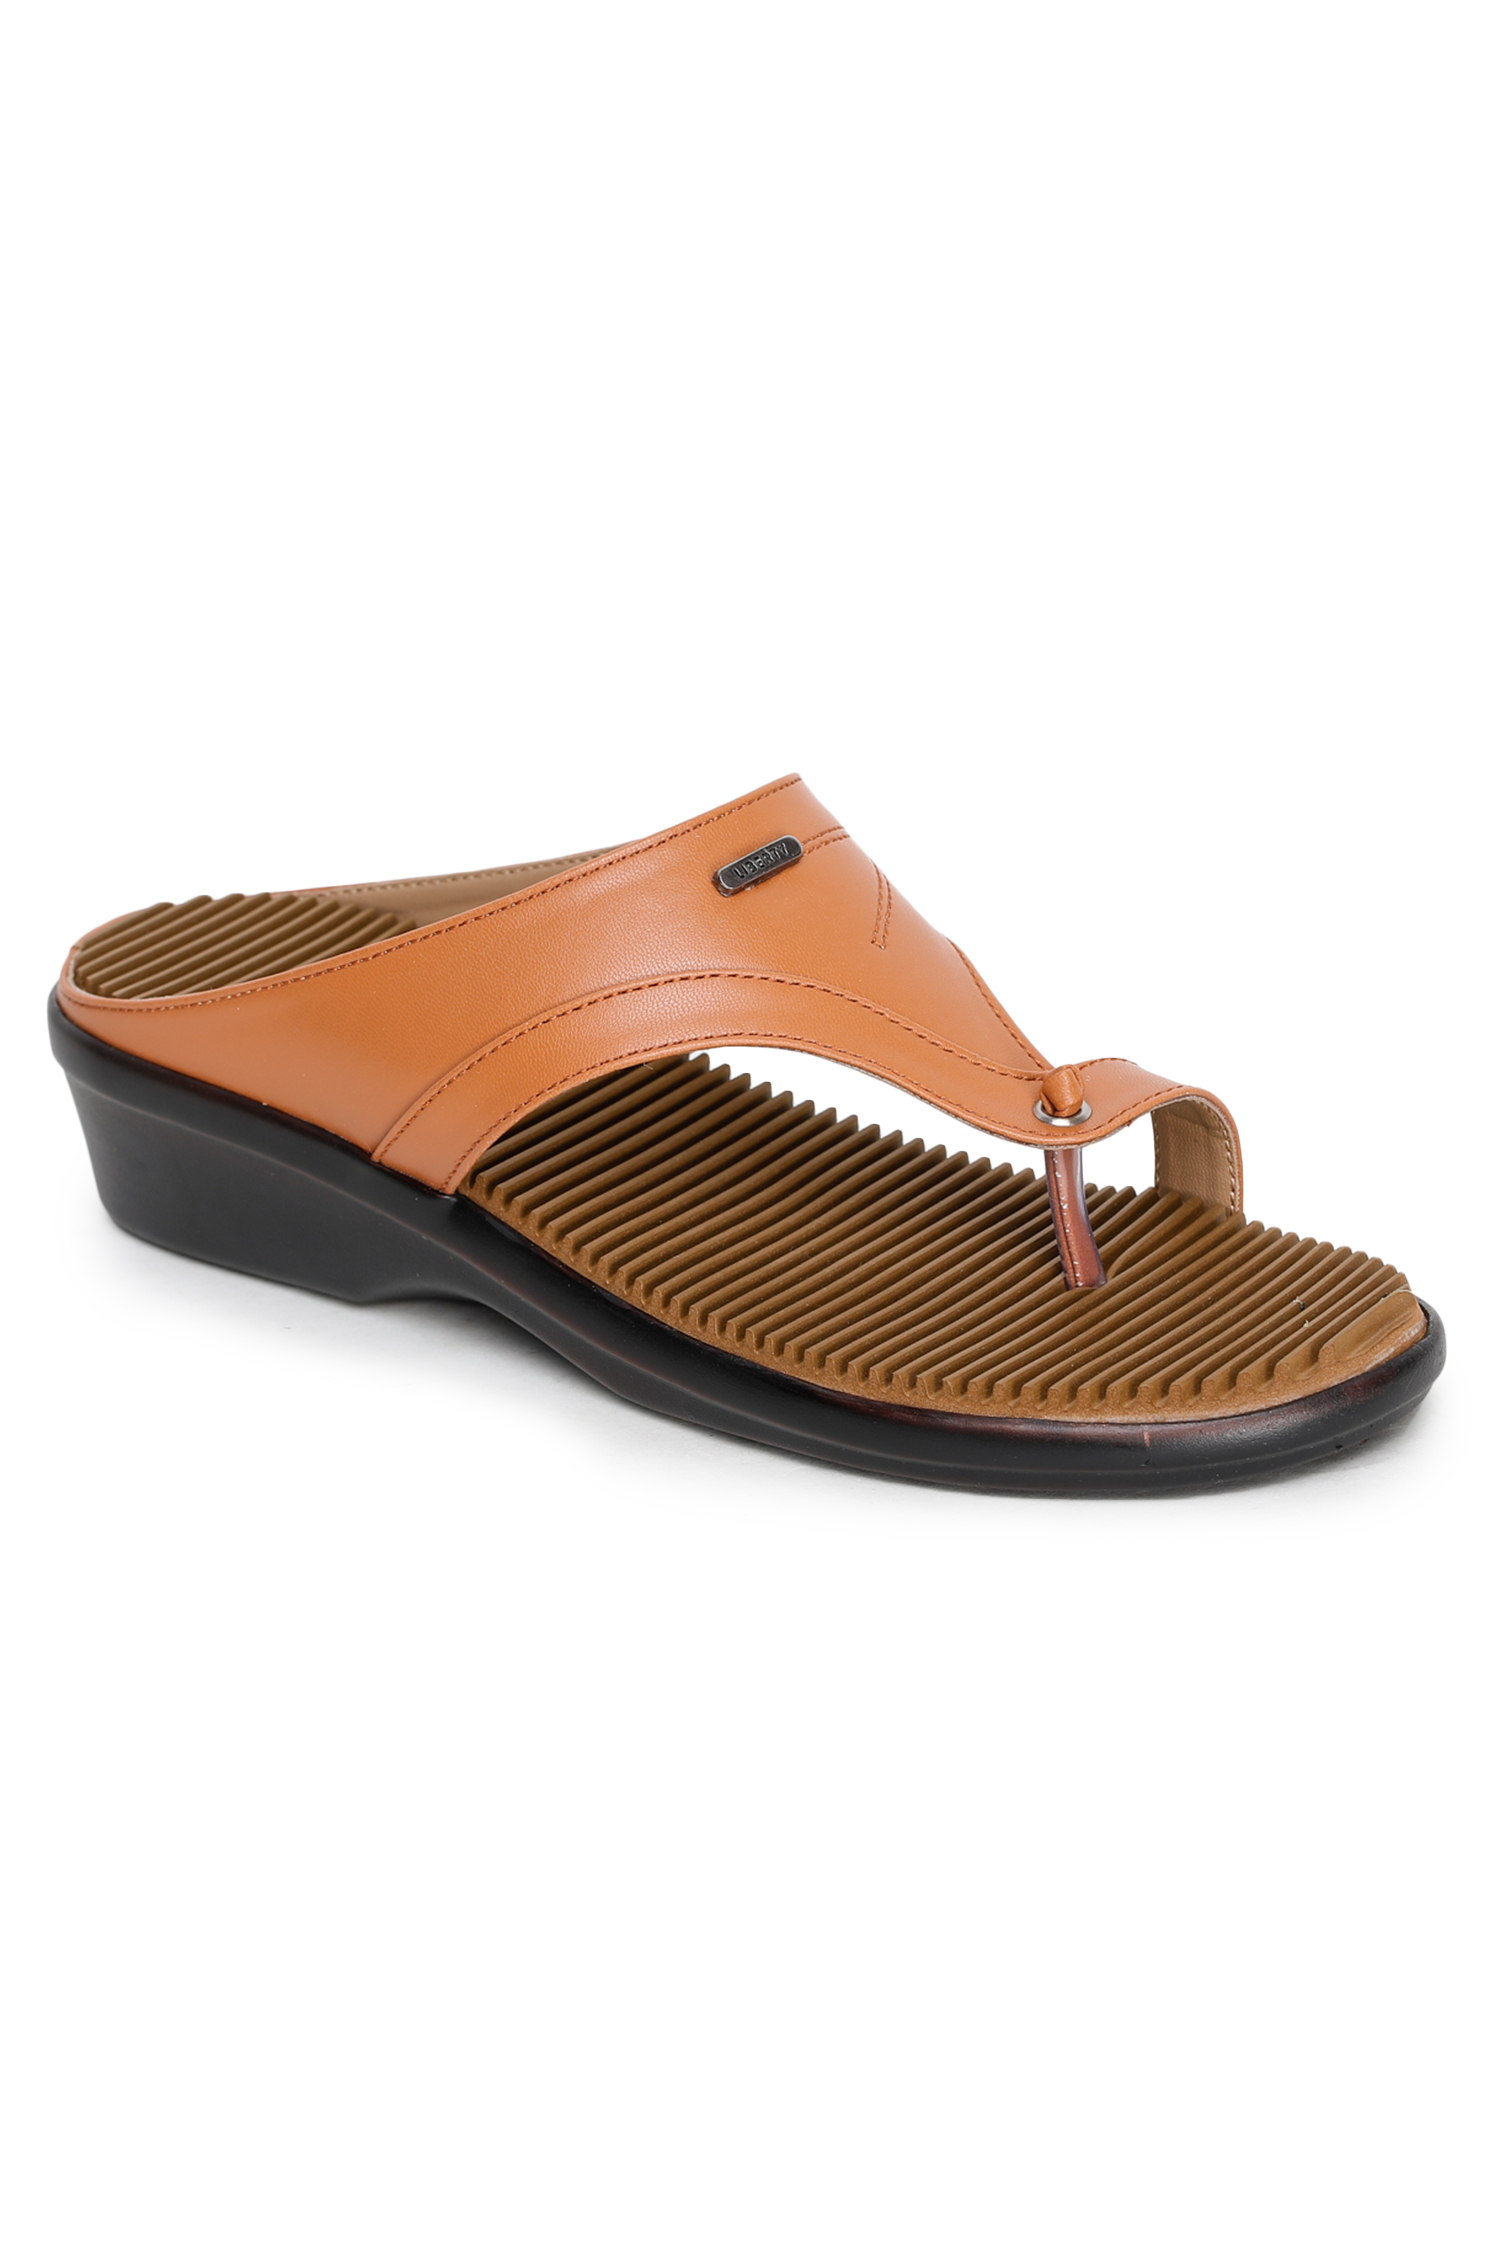 Liberty | Liberty SENORITA Sandals D1-52_TAN For - Women